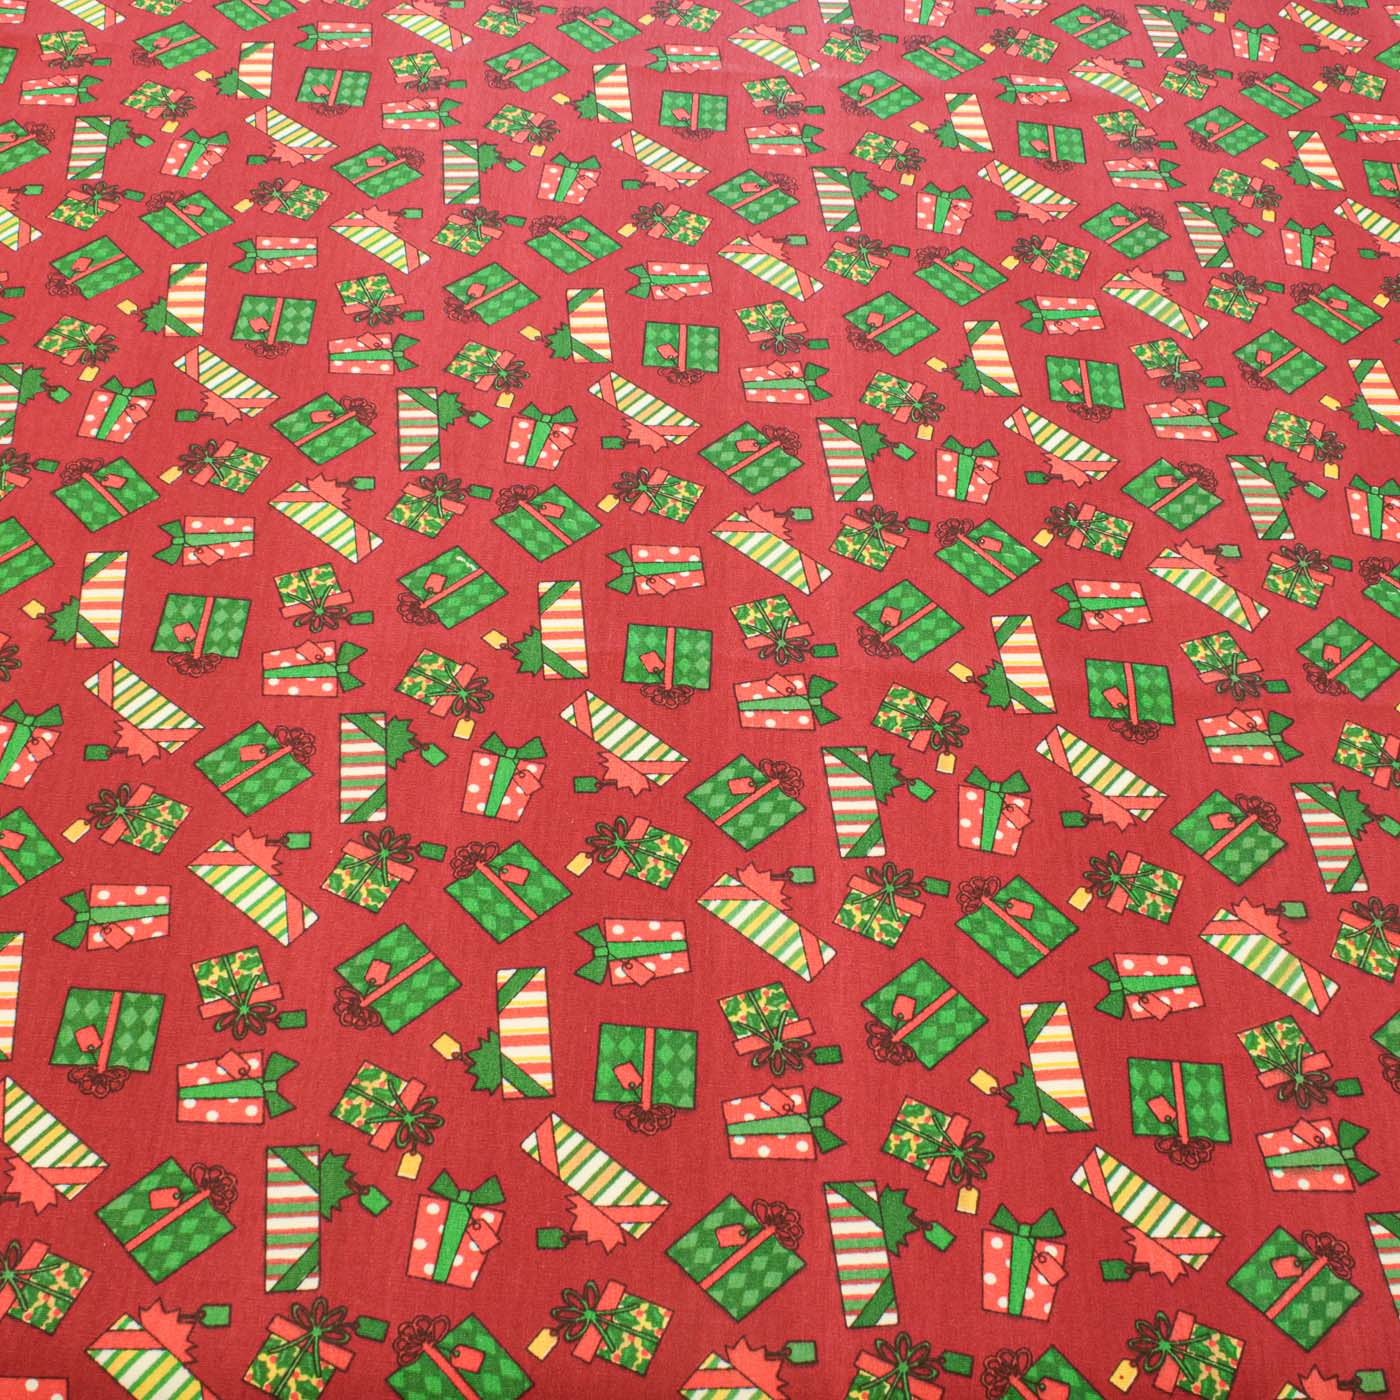 Tecido Tricoline Estampado Natal Presentes Vermelho Marsalla